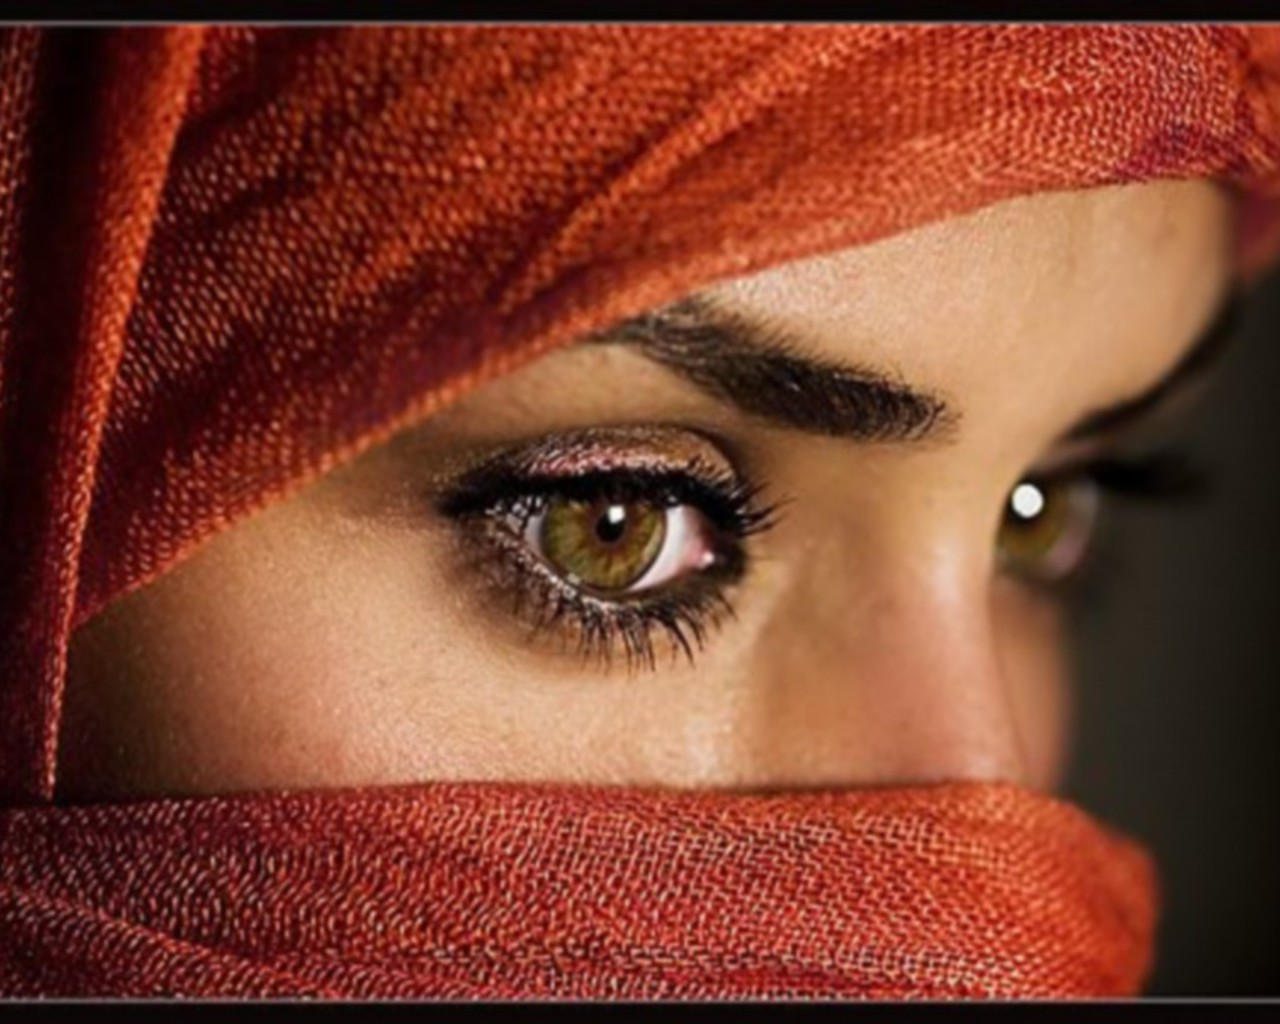 بالصور صور عيون عسليه , اجمل صور للعيون العسلي 3629 5